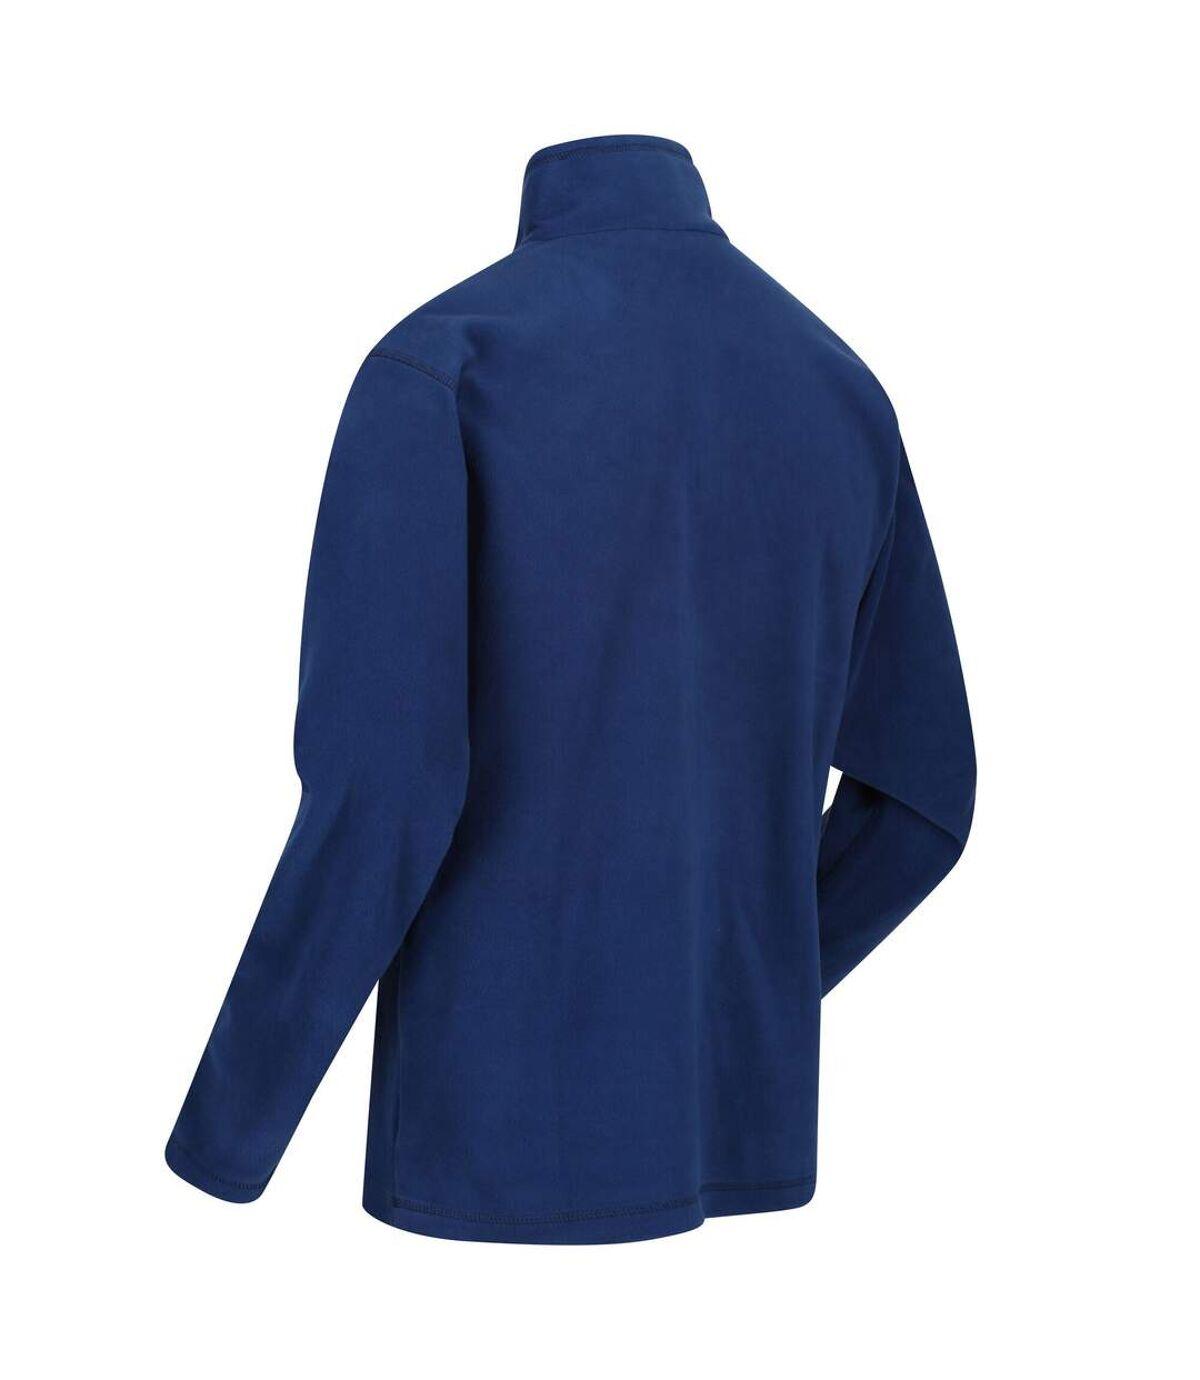 Regatta - Polaire THOMPSON - Homme (Bleu marine) - UTRG5292